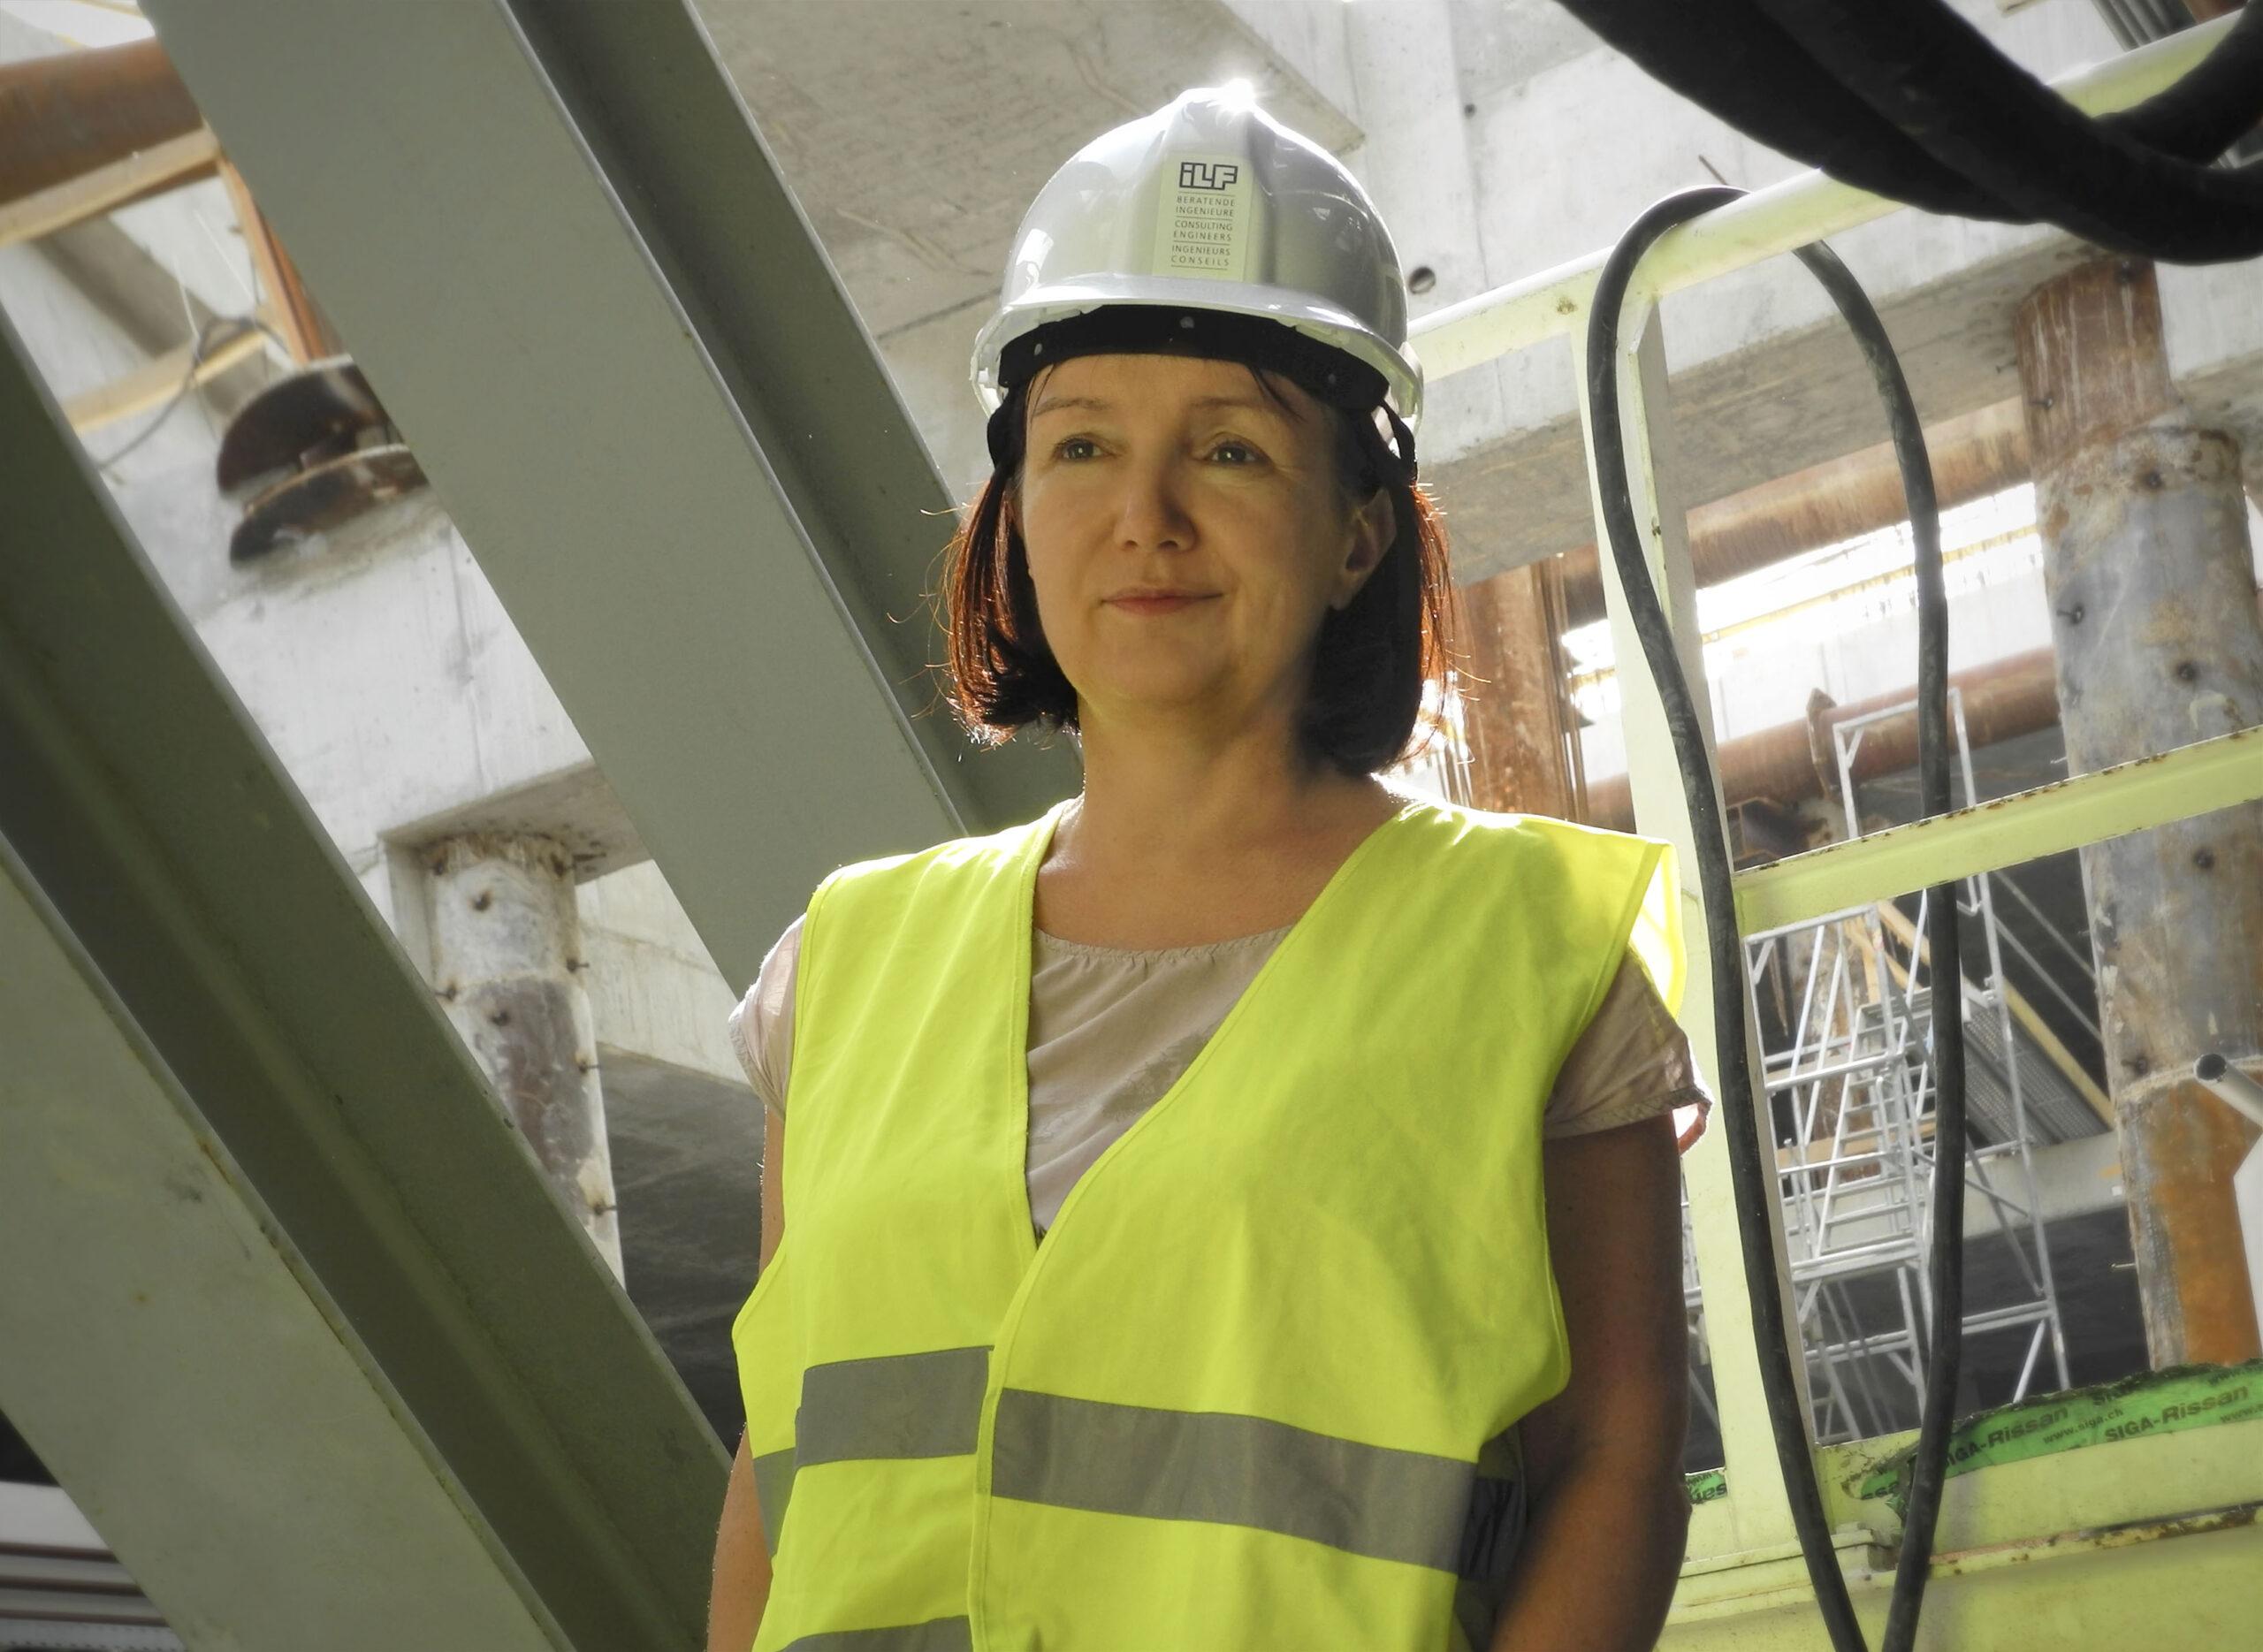 Kobieta inżynier – o stereotypach, inspiracjach i mentoringu